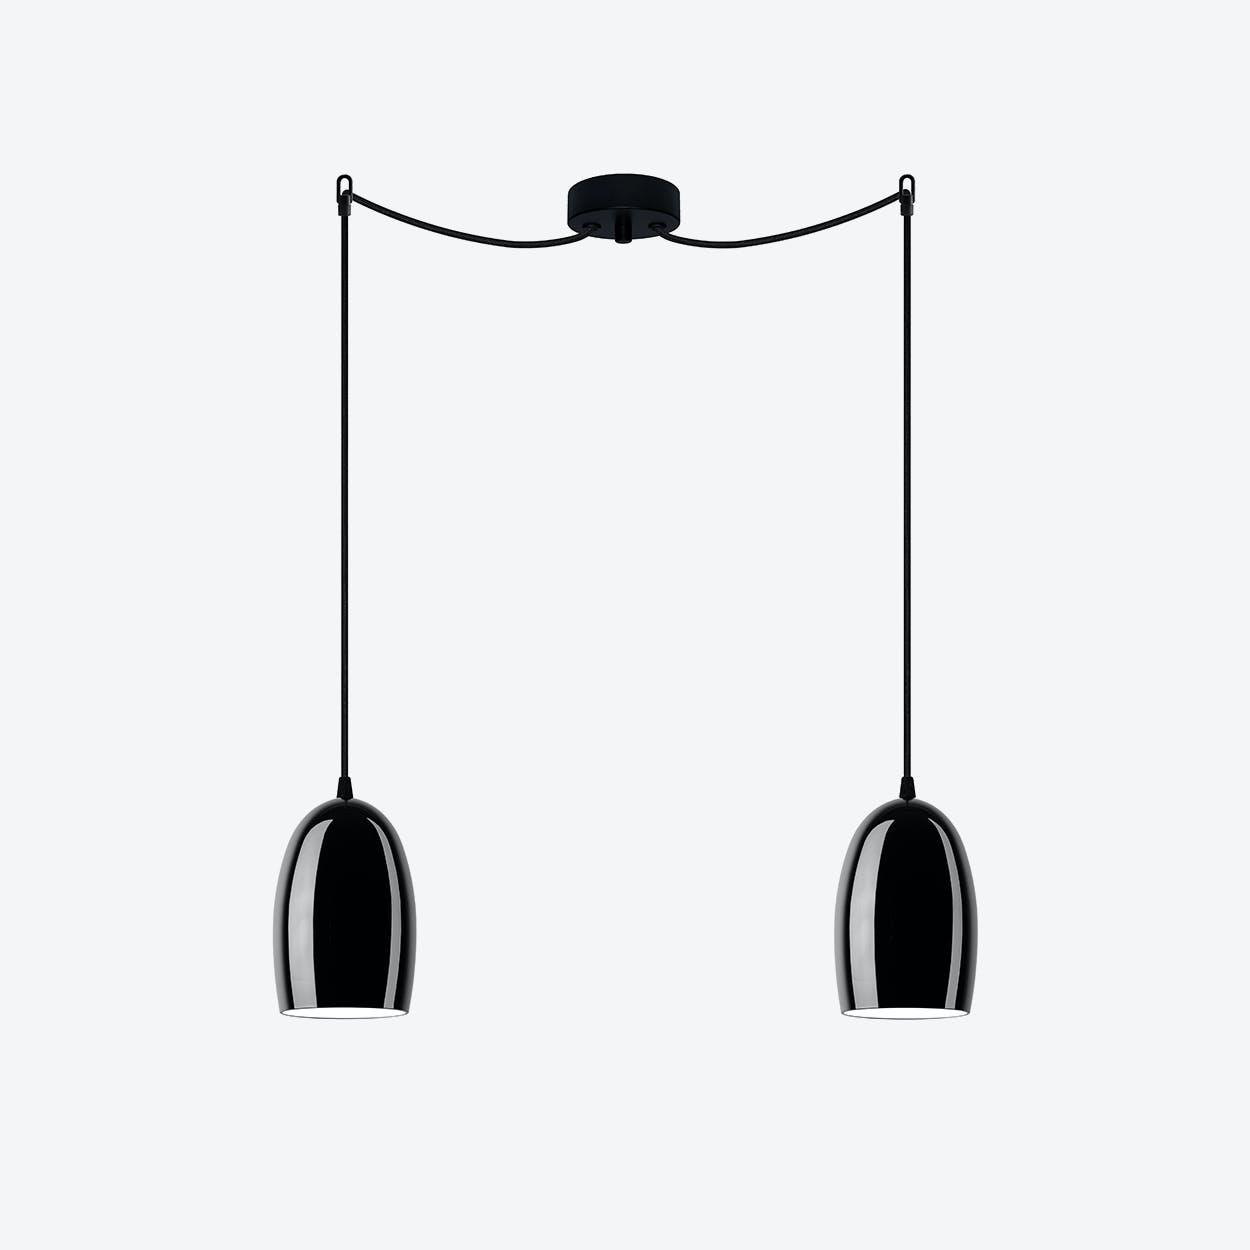 UME Double Pendant Light in Glossy Black